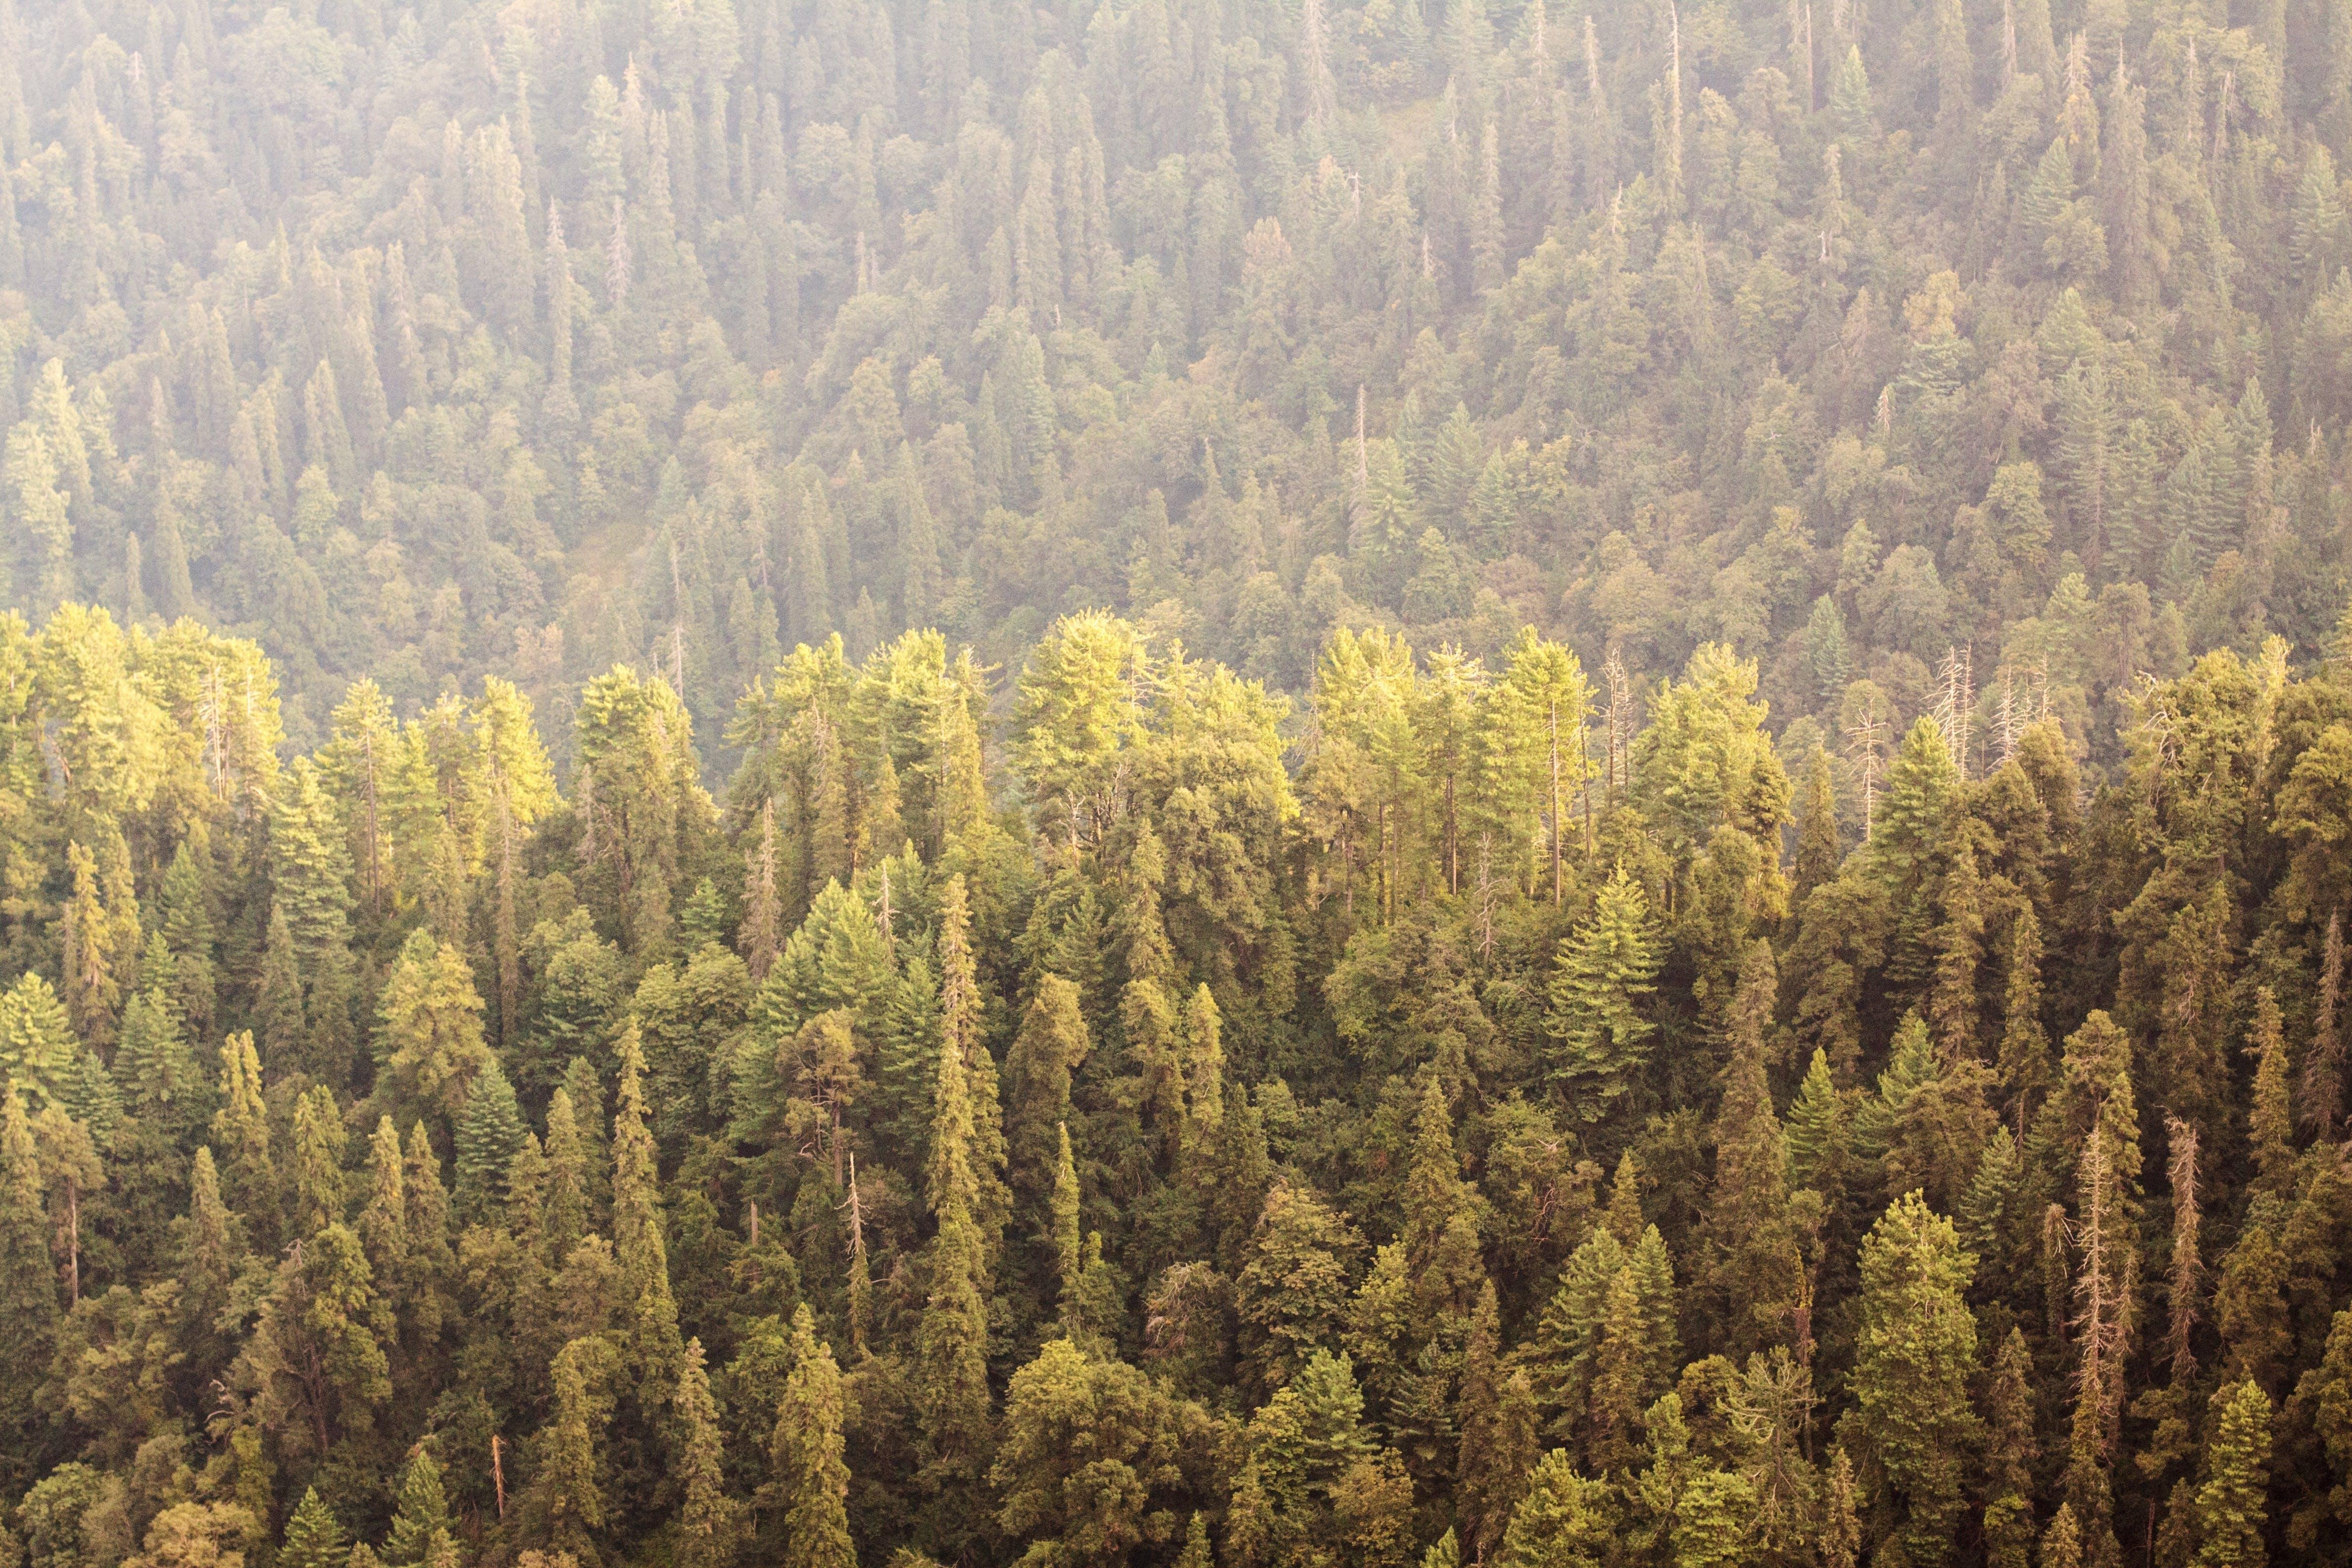 Kostenloses Stock Foto zu landschaft, berge, wald, bäume